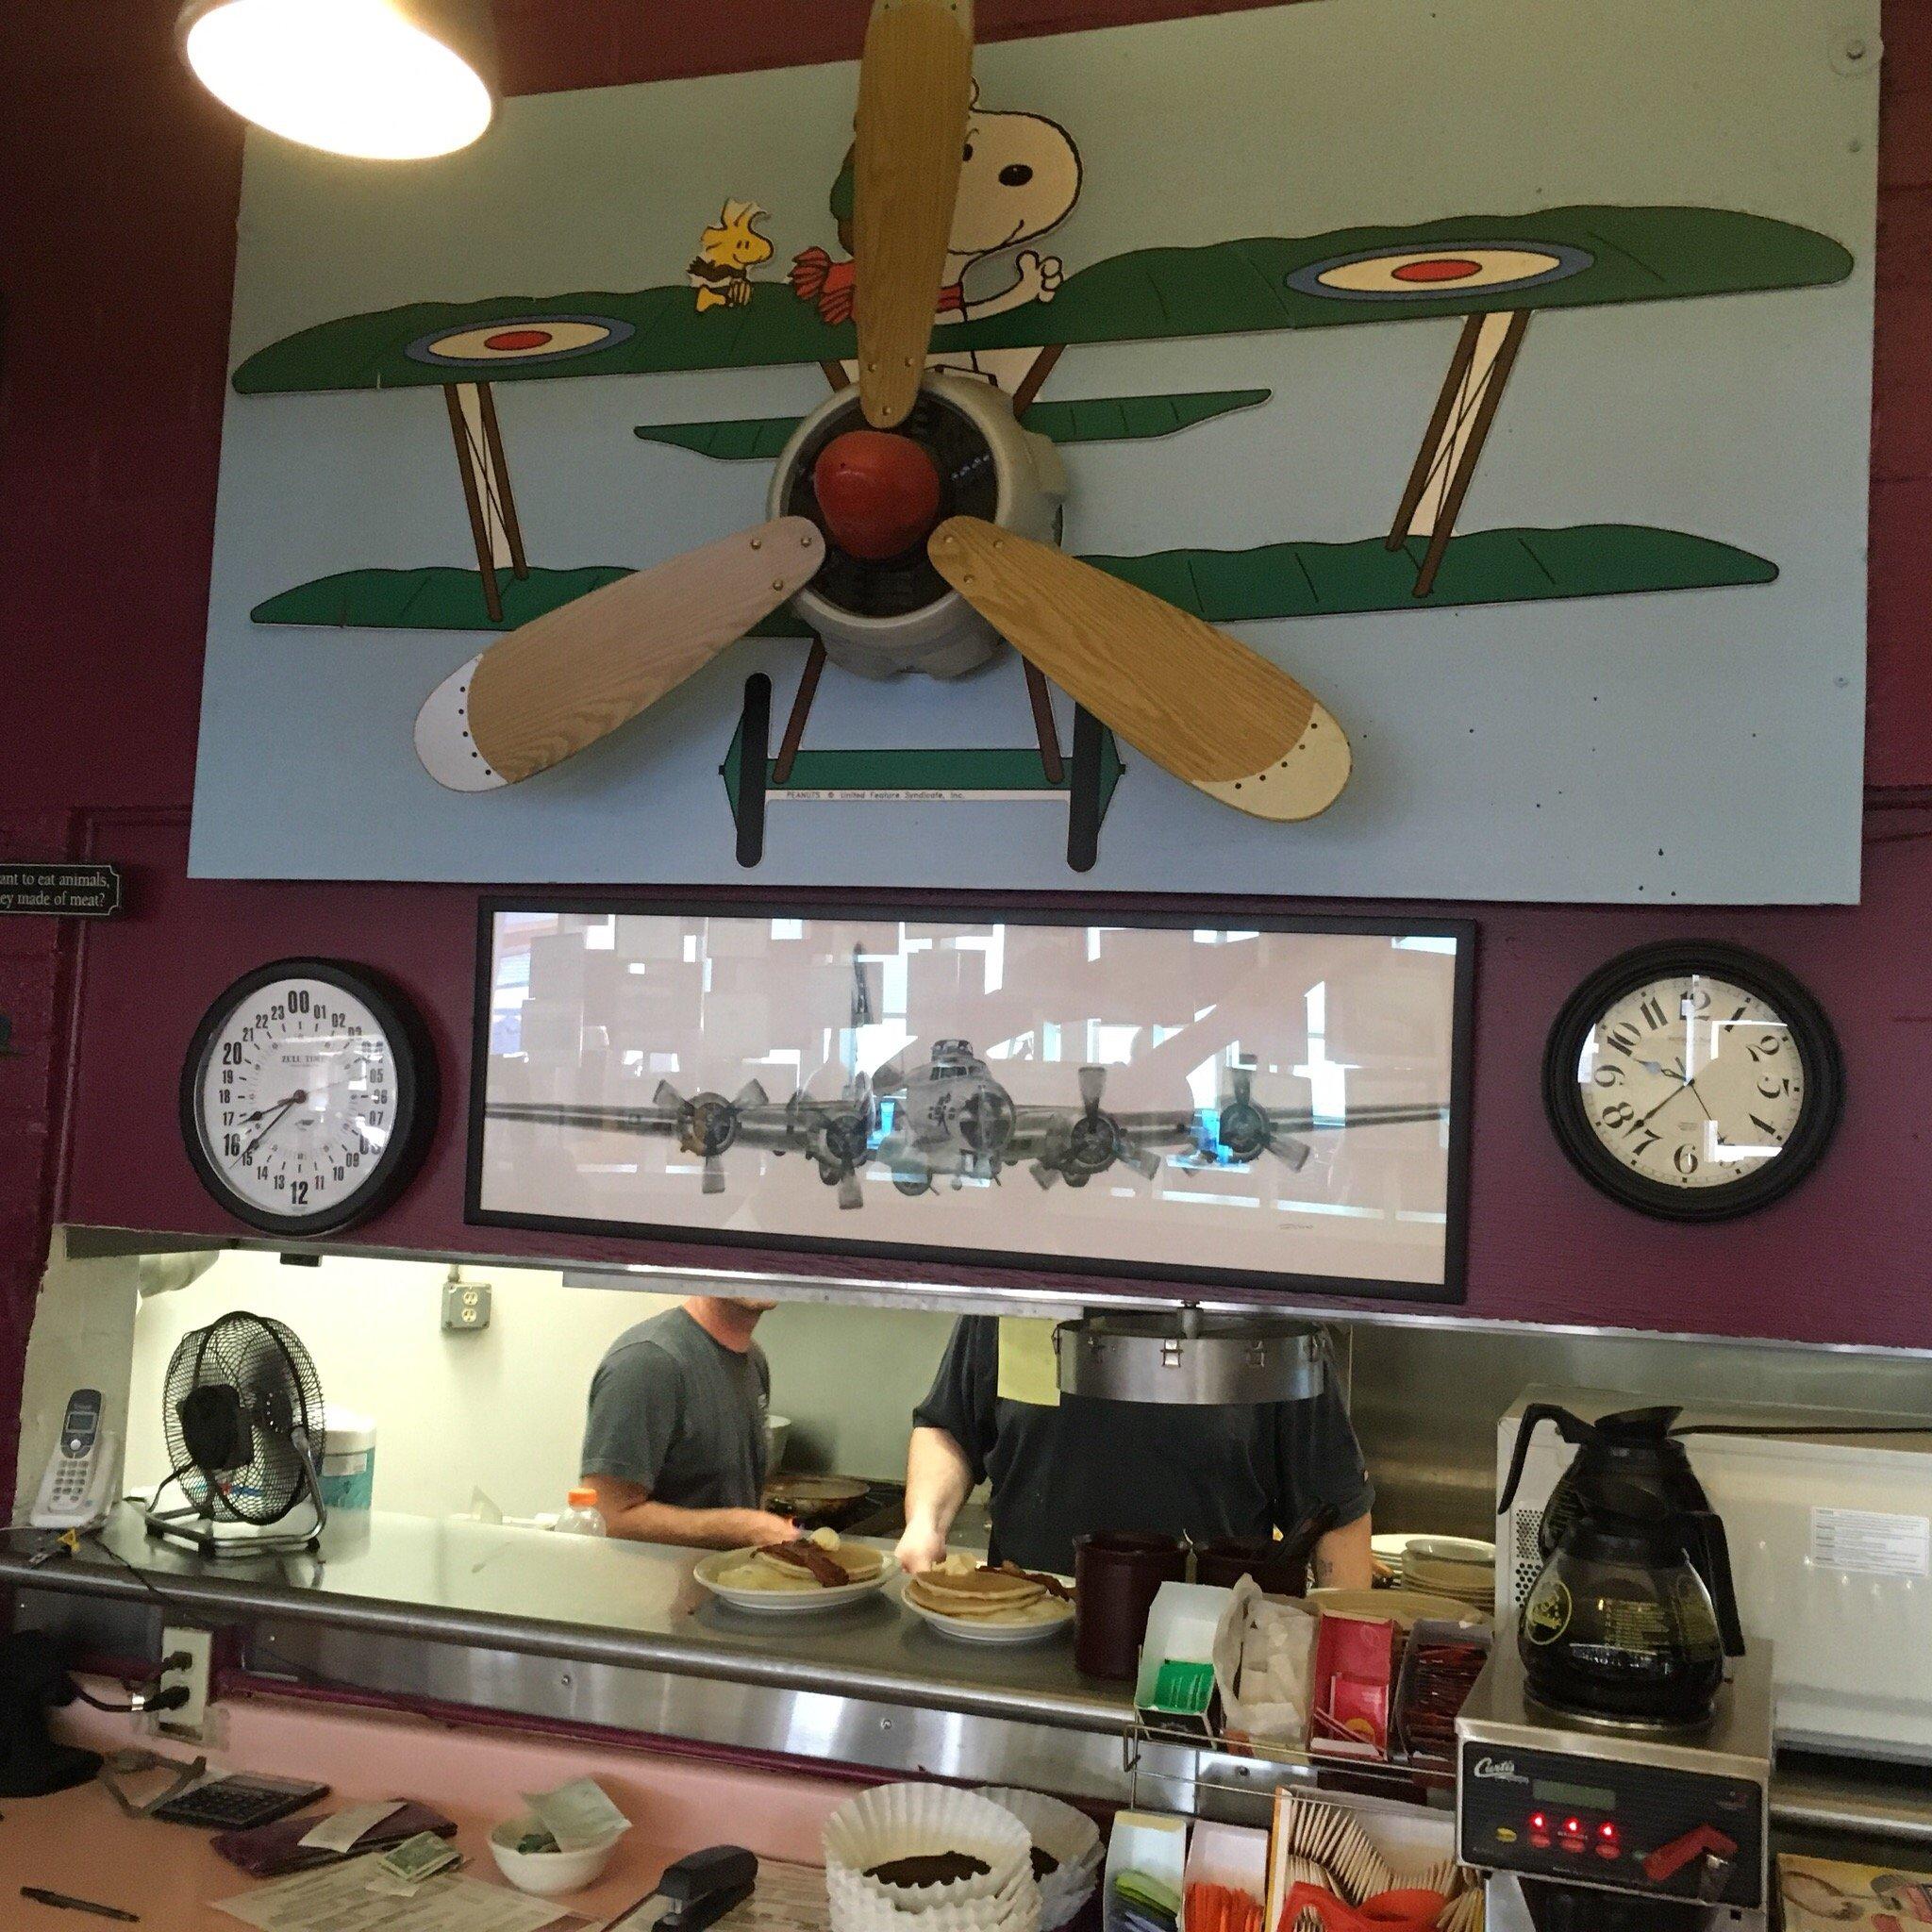 Susie's Skyway Restaurant 6500 Mac Curdy Dr, Prescott